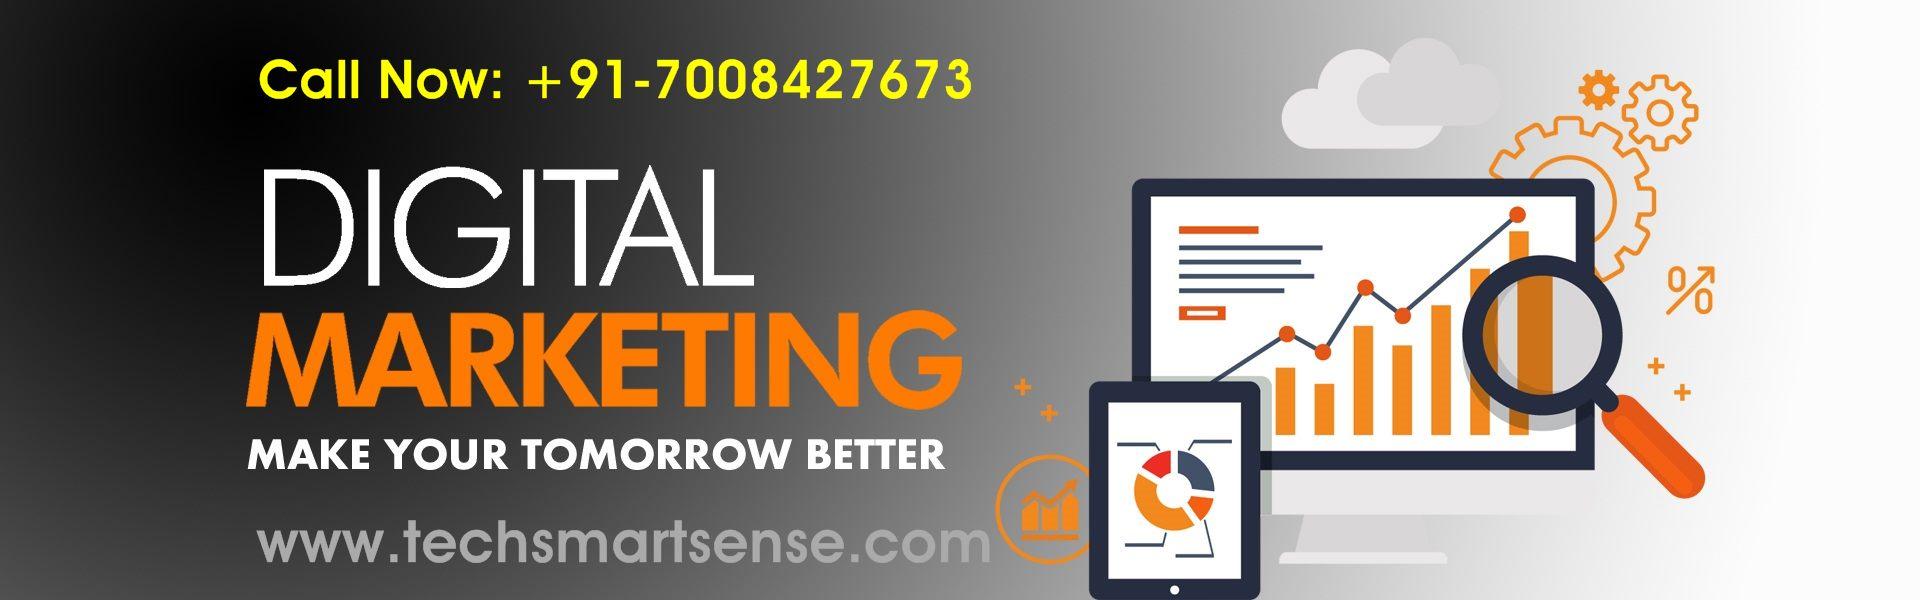 Tech Smart Sense - The Next-Generation Best Digital Marketing Service Provider In Bhubaneswar